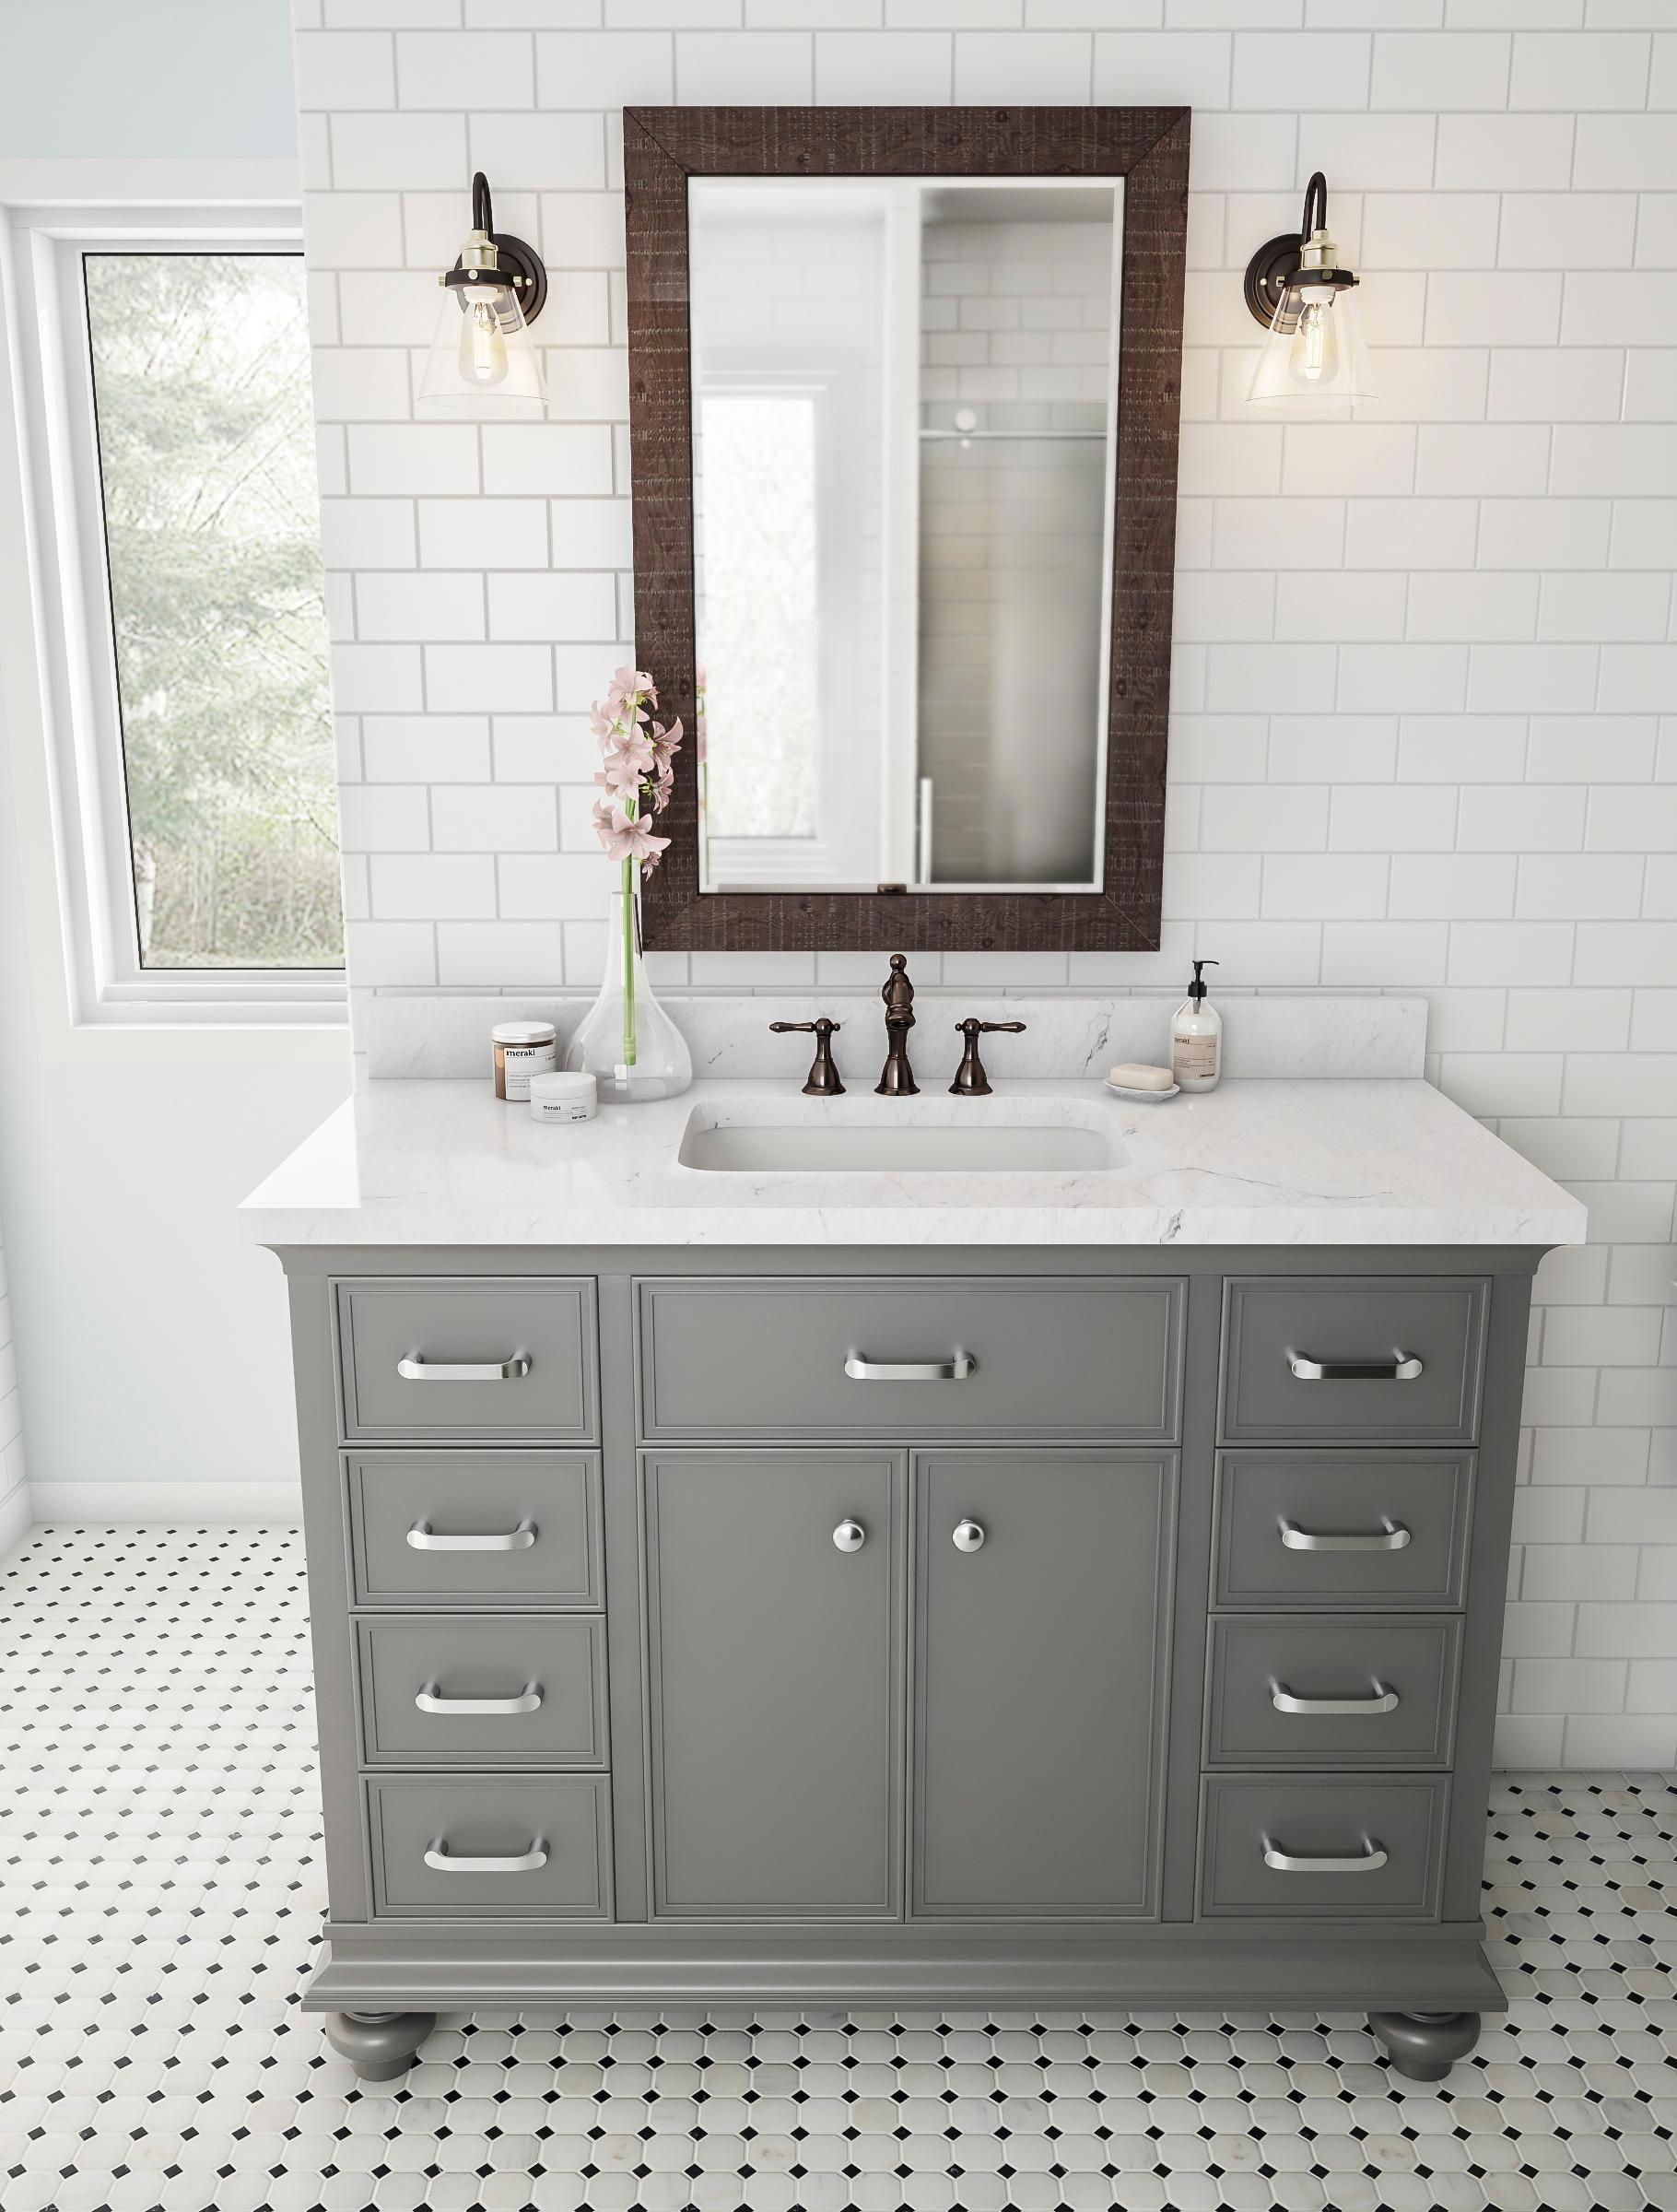 16 Radiant Bathroom Remodel Videos Ideas Home Depot Bathroom